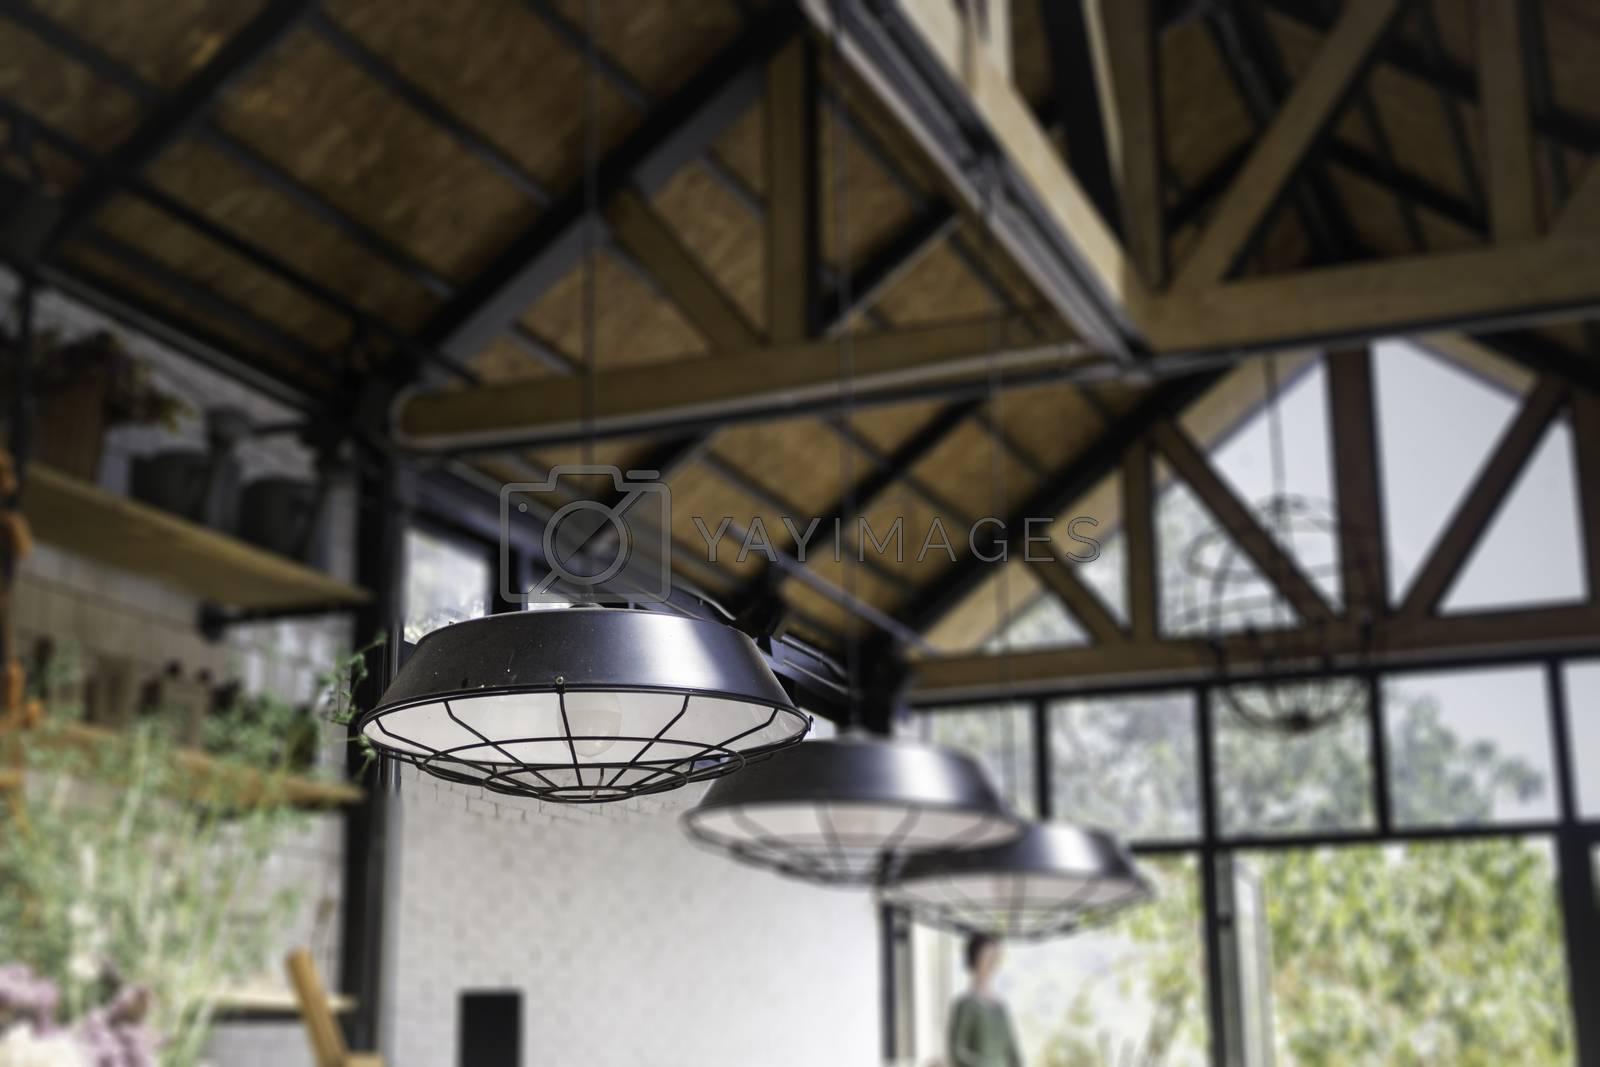 Decorating hanging vintage bulb lamp, stock photo